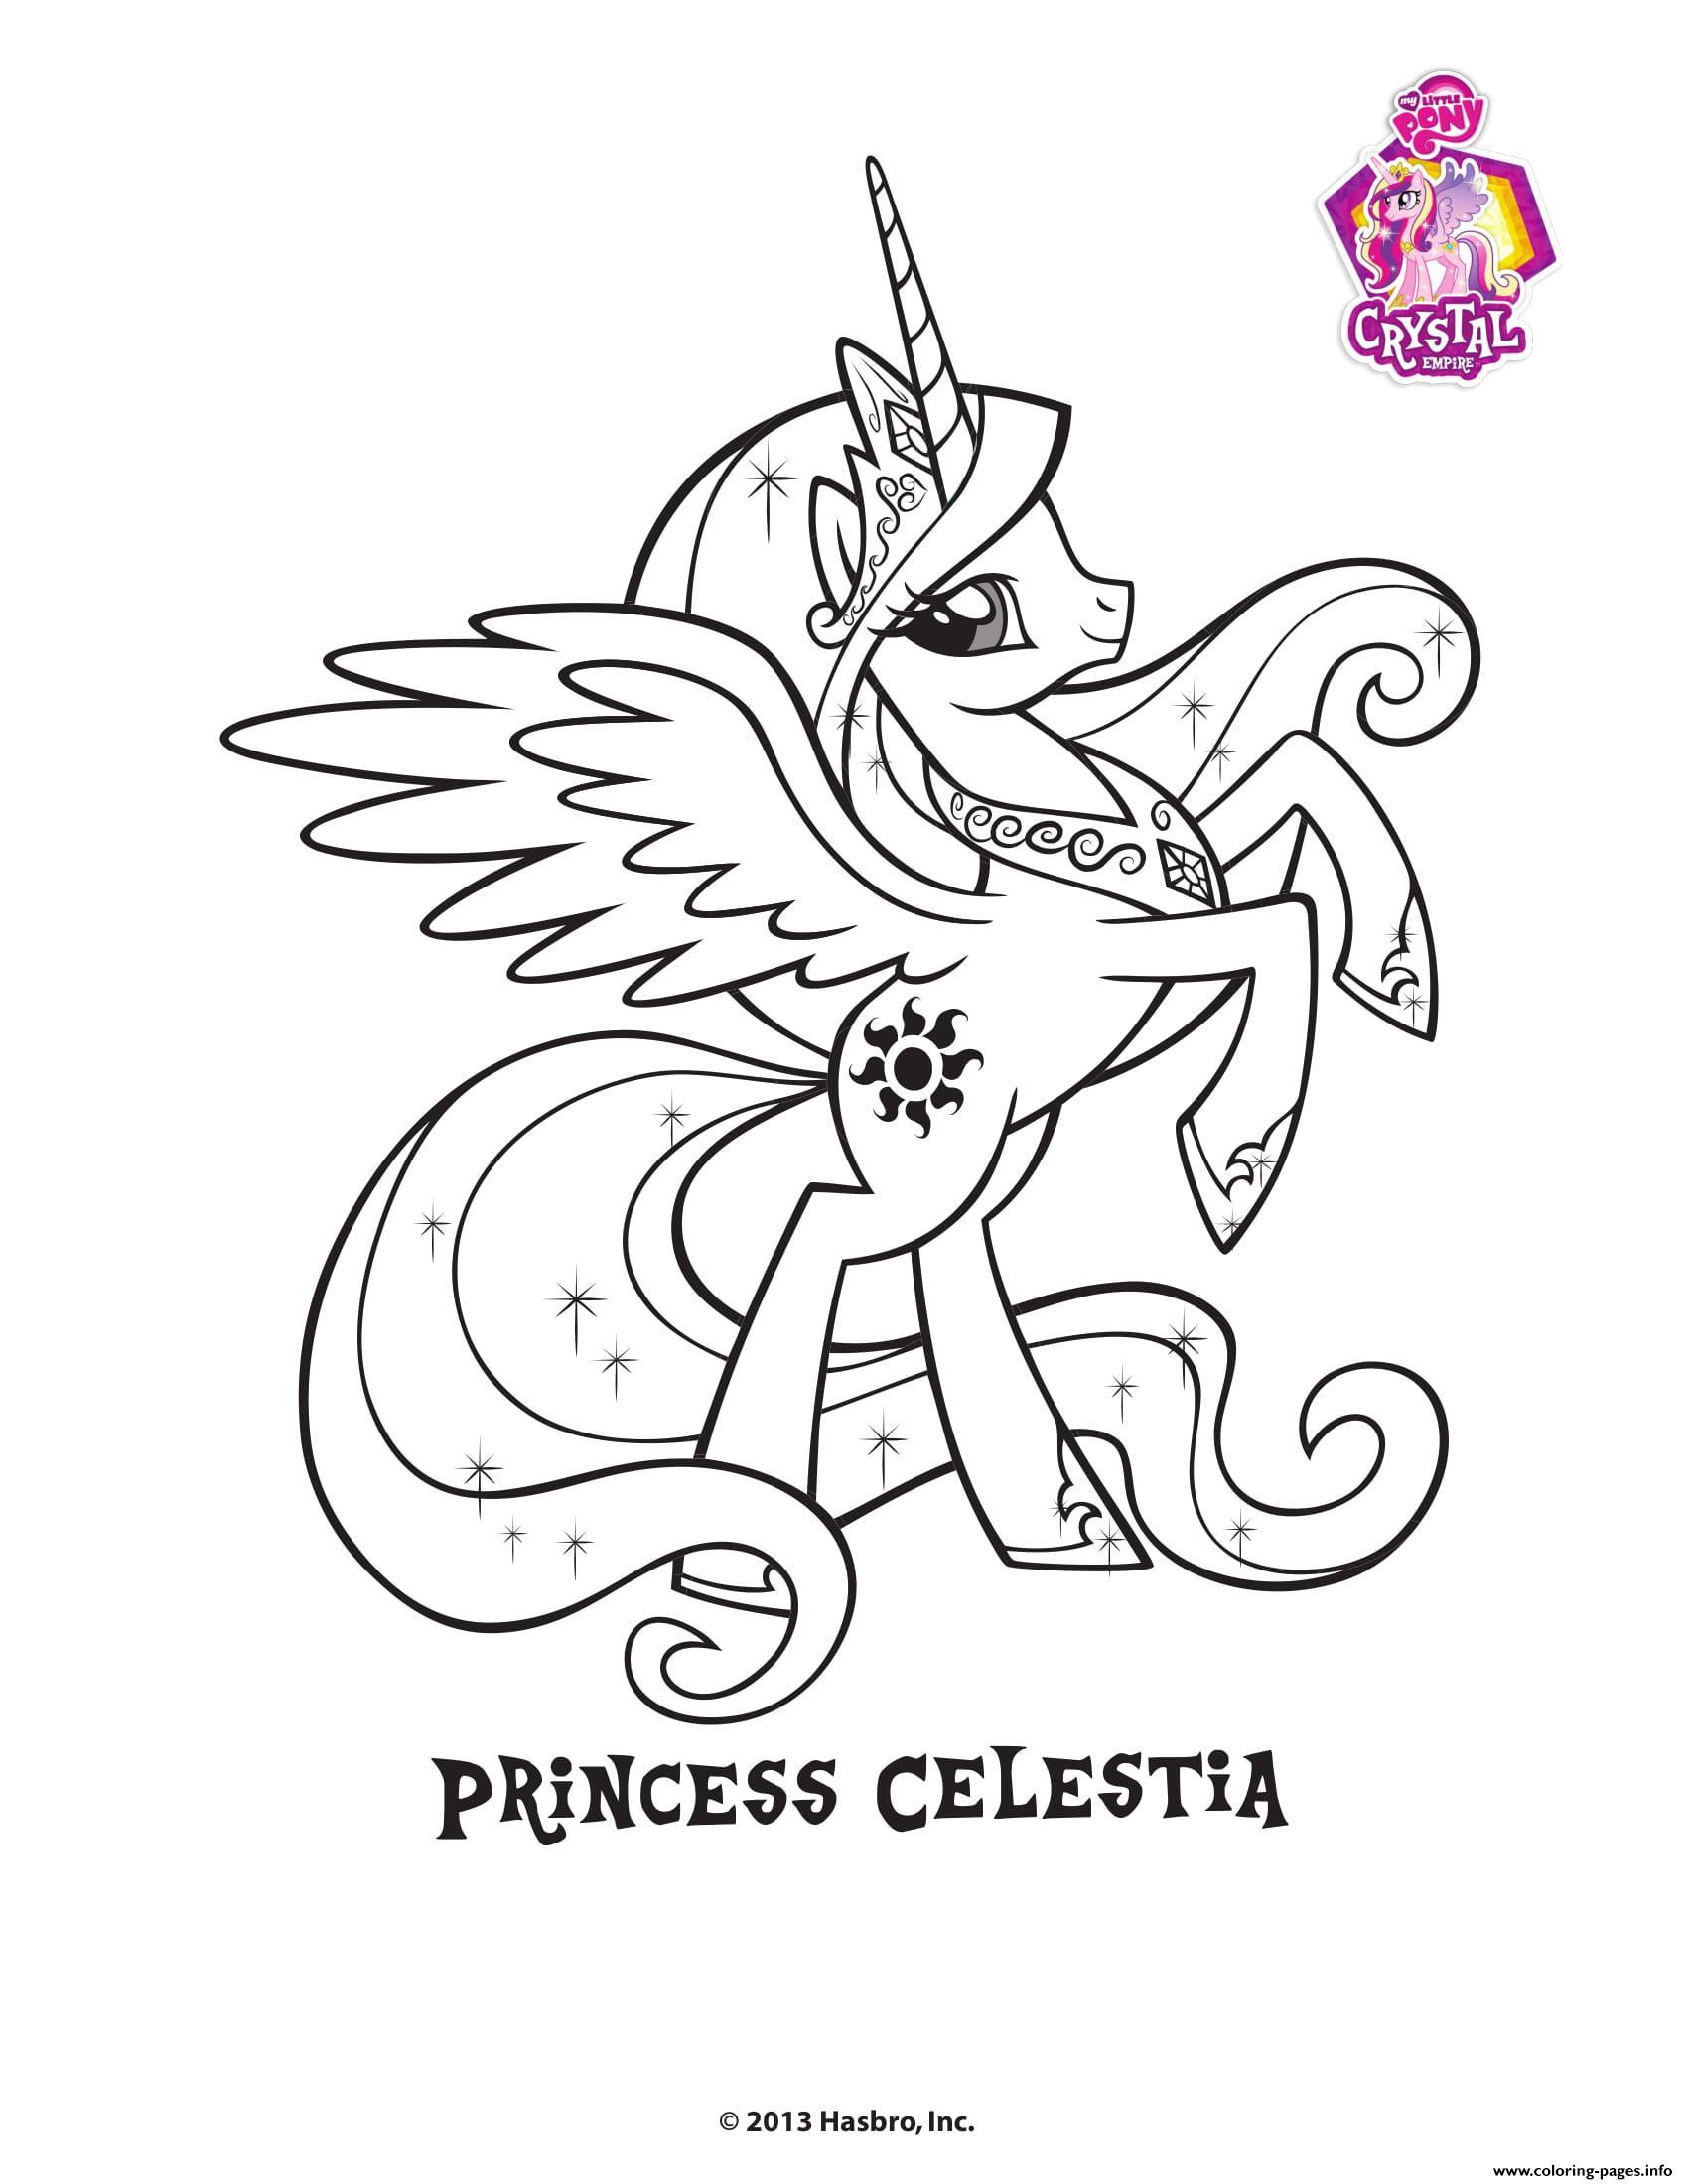 Princess Celestra Crystal Empire My Little Pony Coloring intérieur Coloriage Gratuit My Little Pony